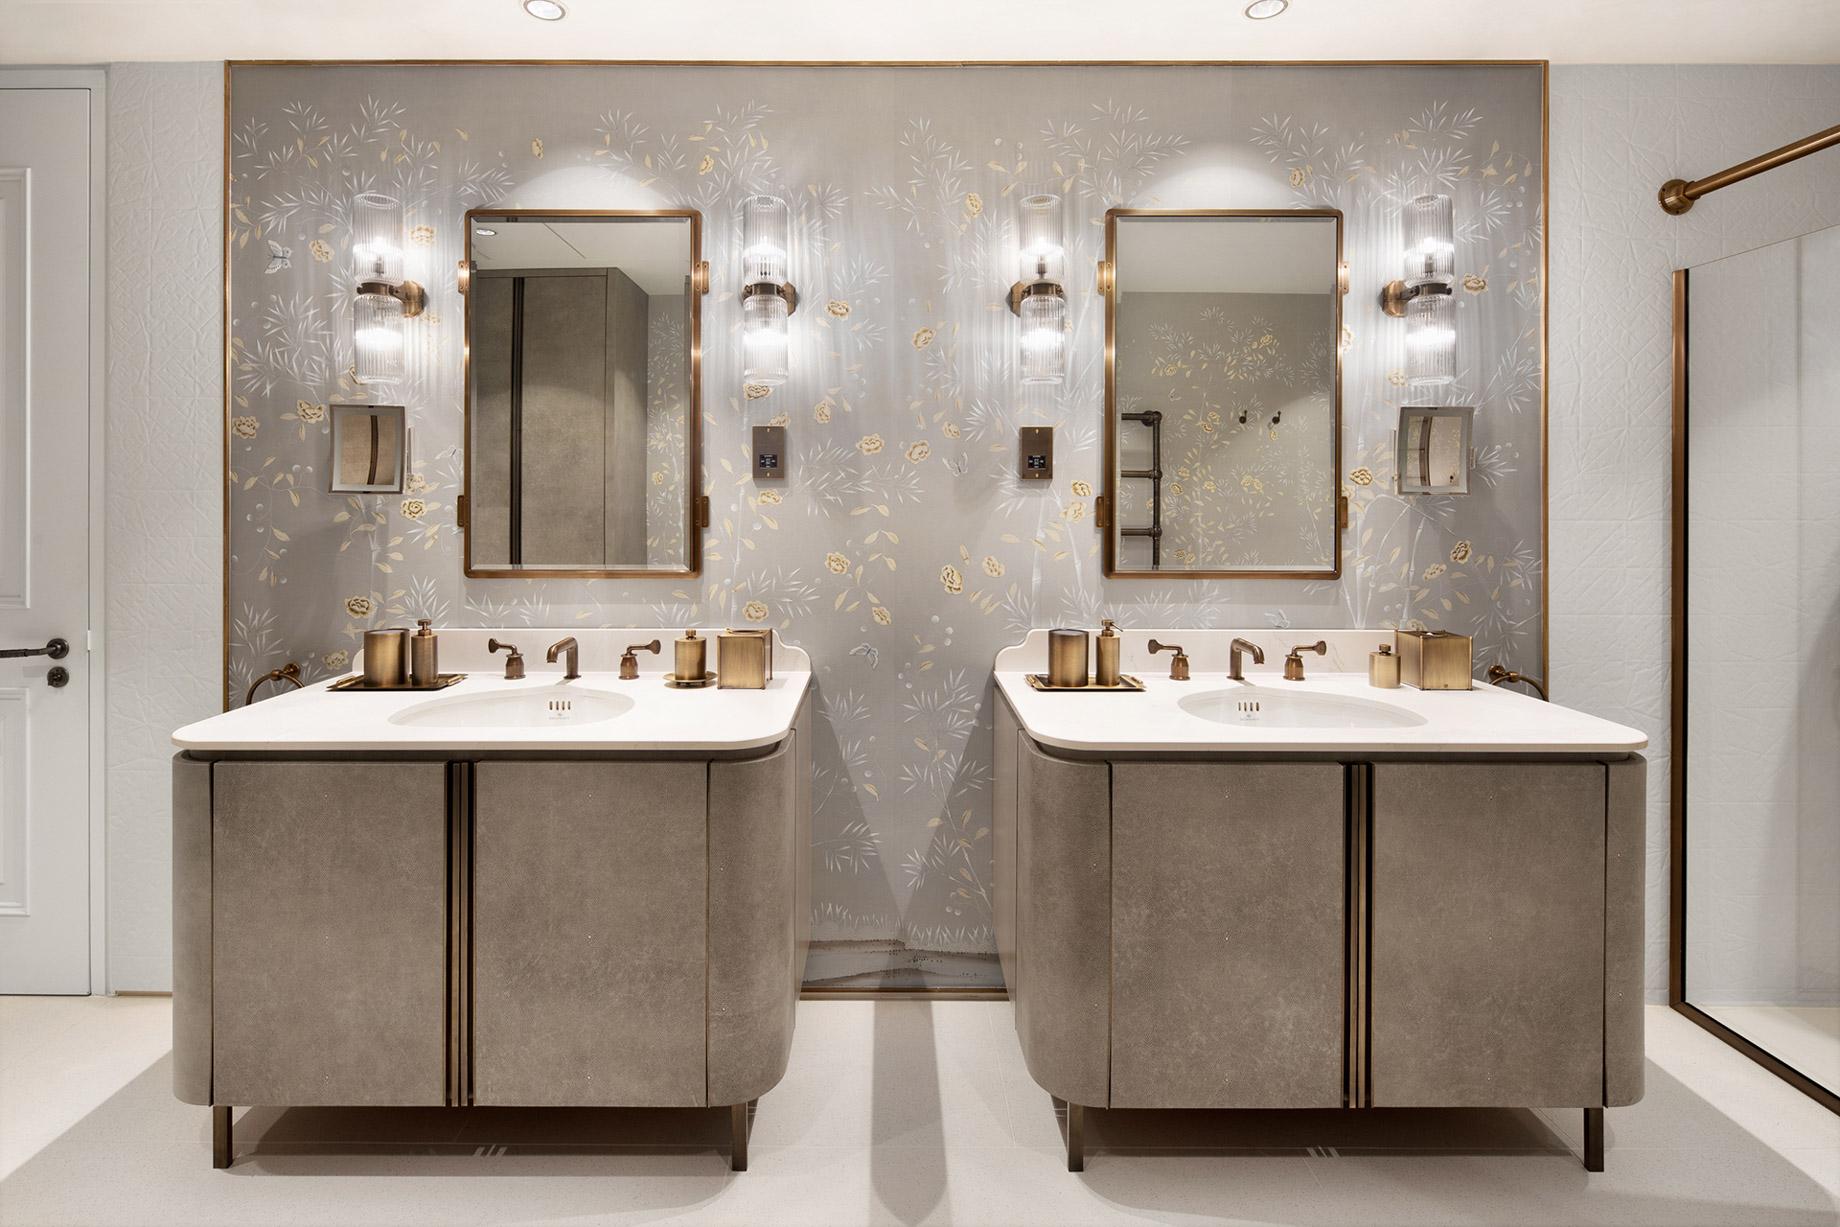 Luxury Villa Living Bathroom Vanity - Indonesia